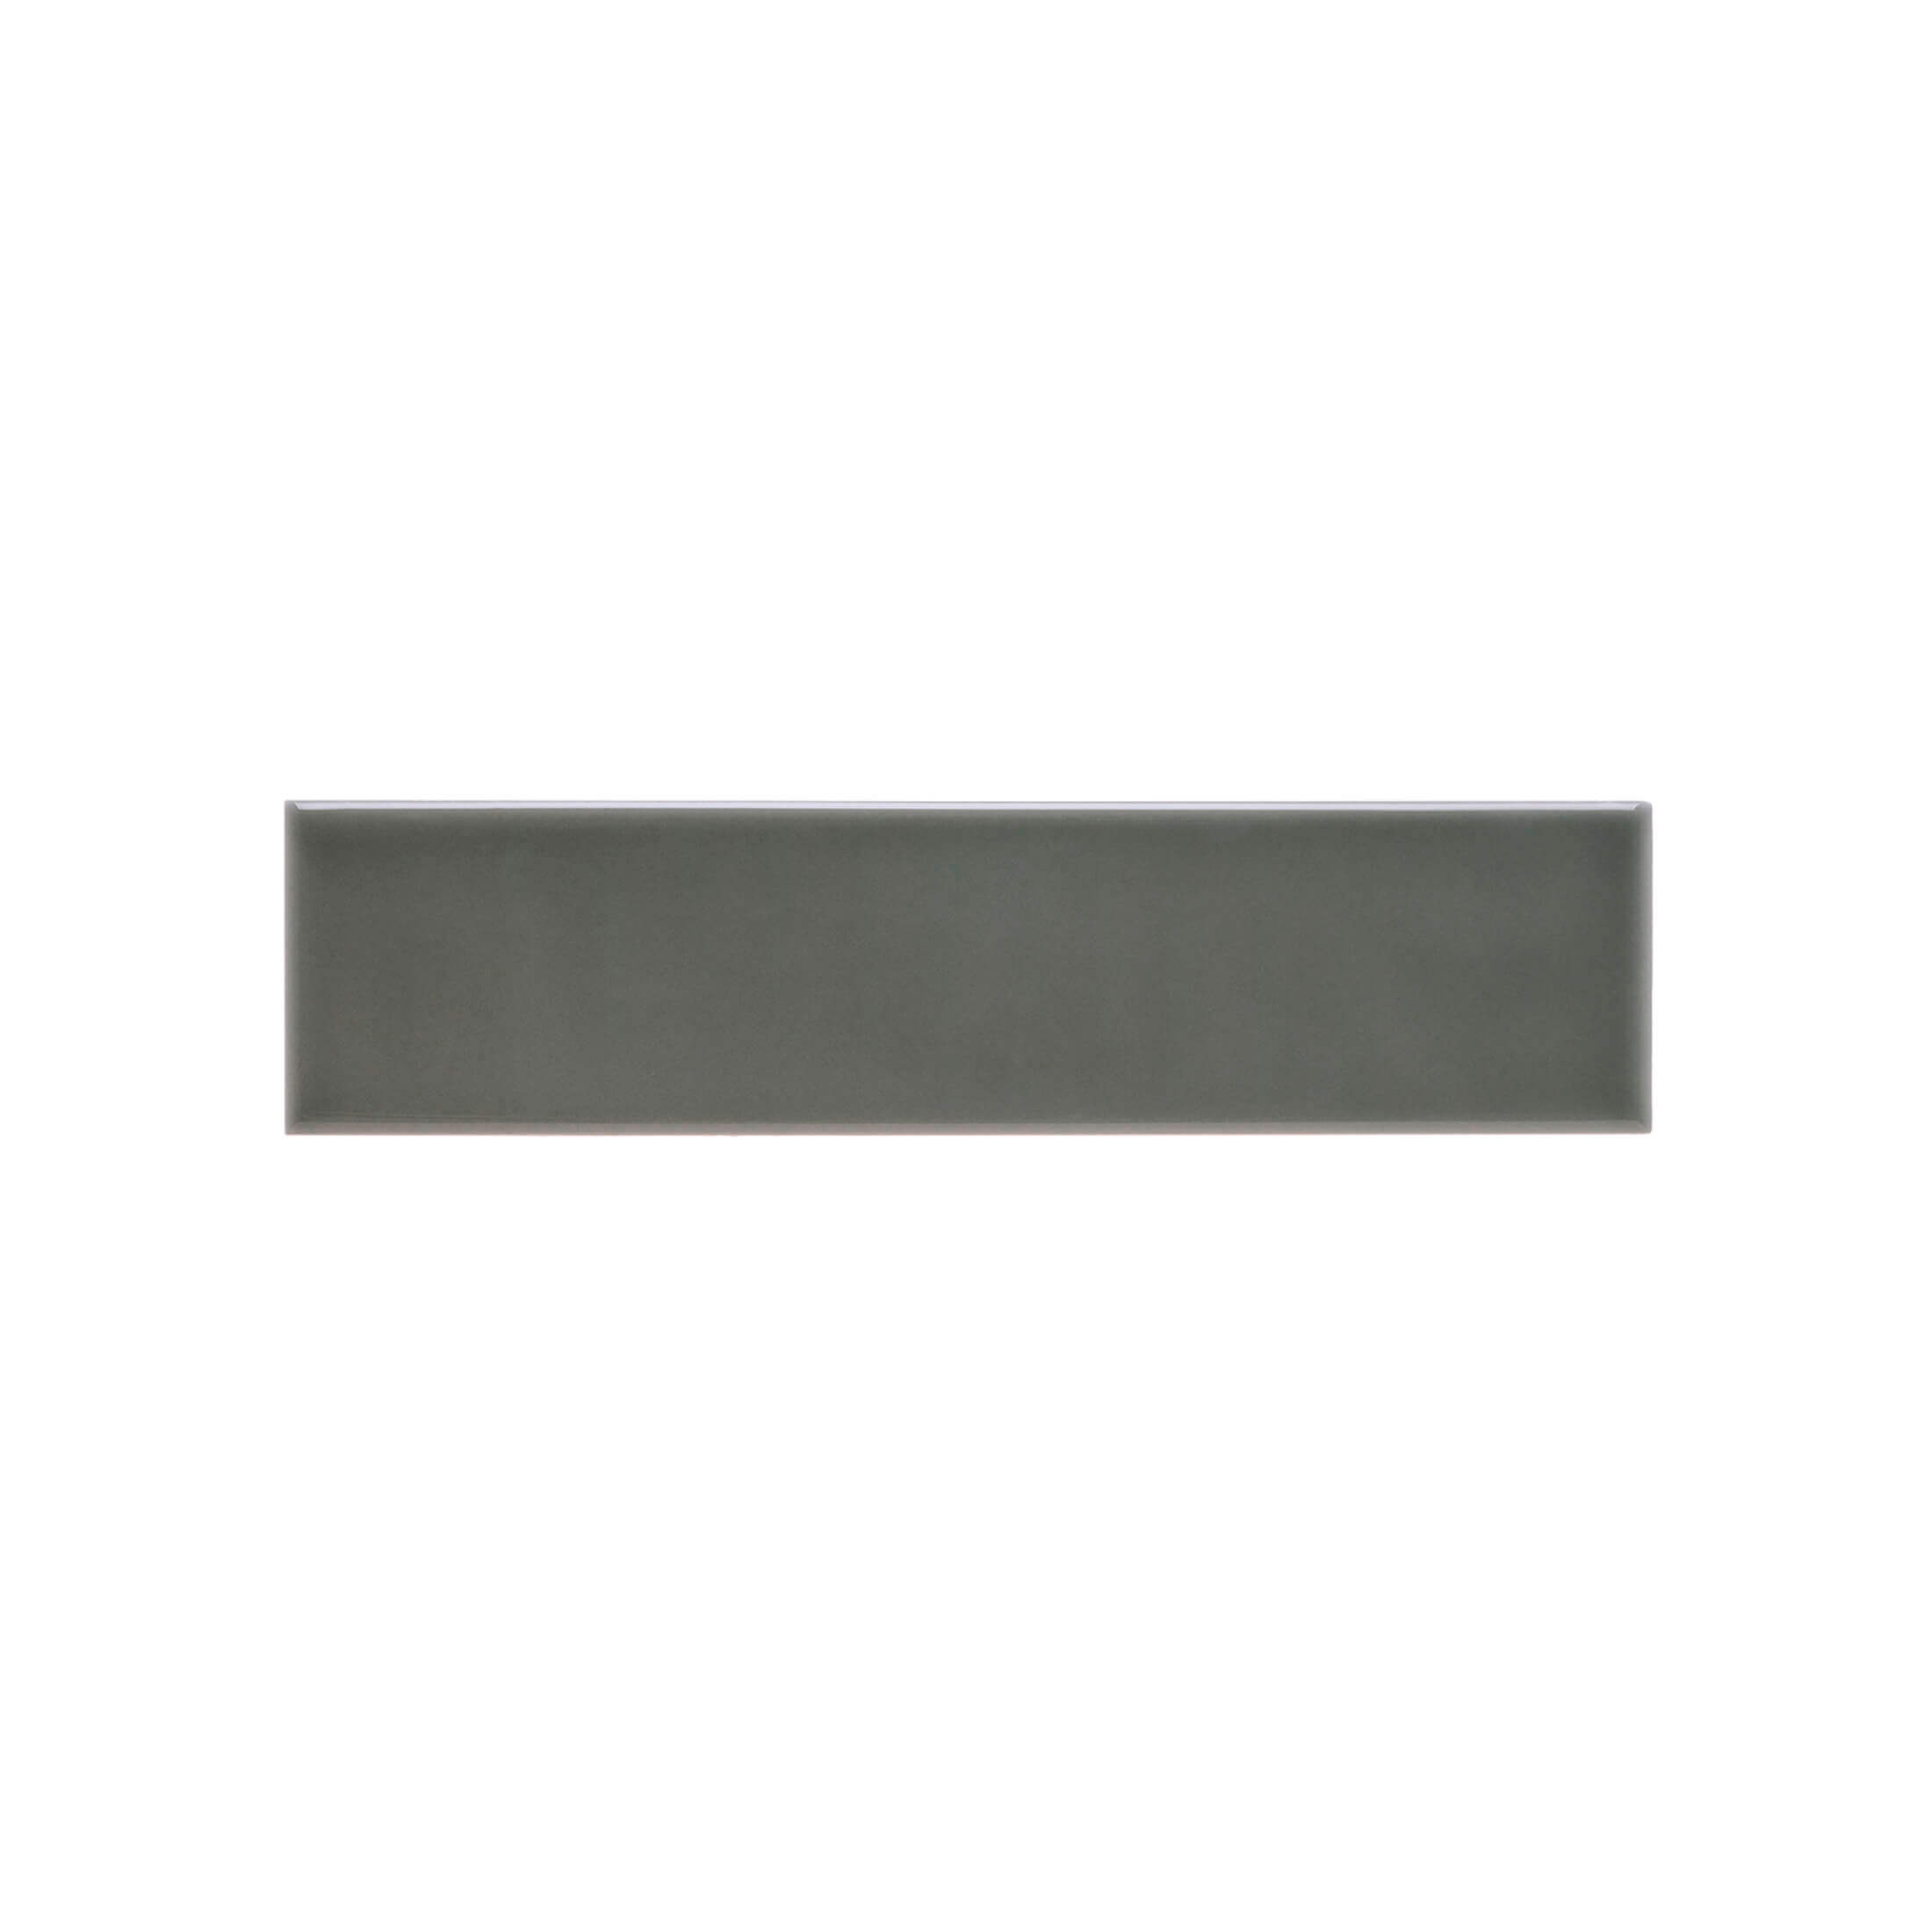 ADST1038 - LISO  - 4.9 cm X 19.8 cm